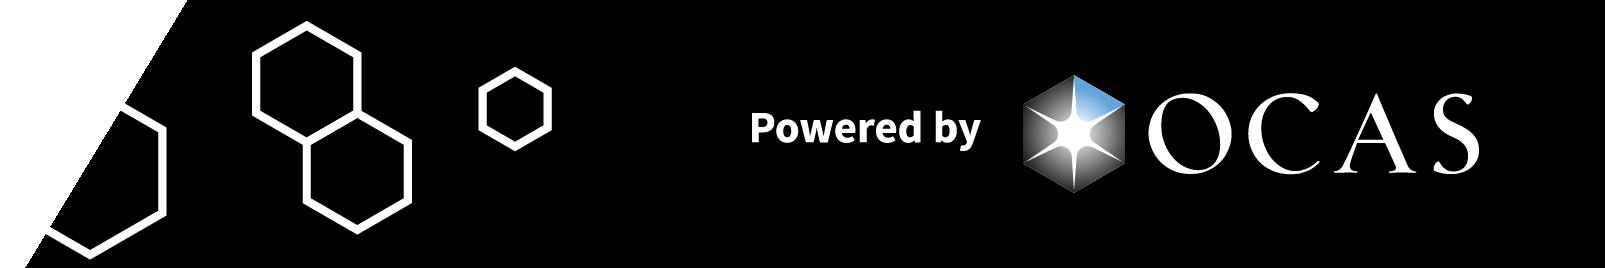 Powered by OCAS